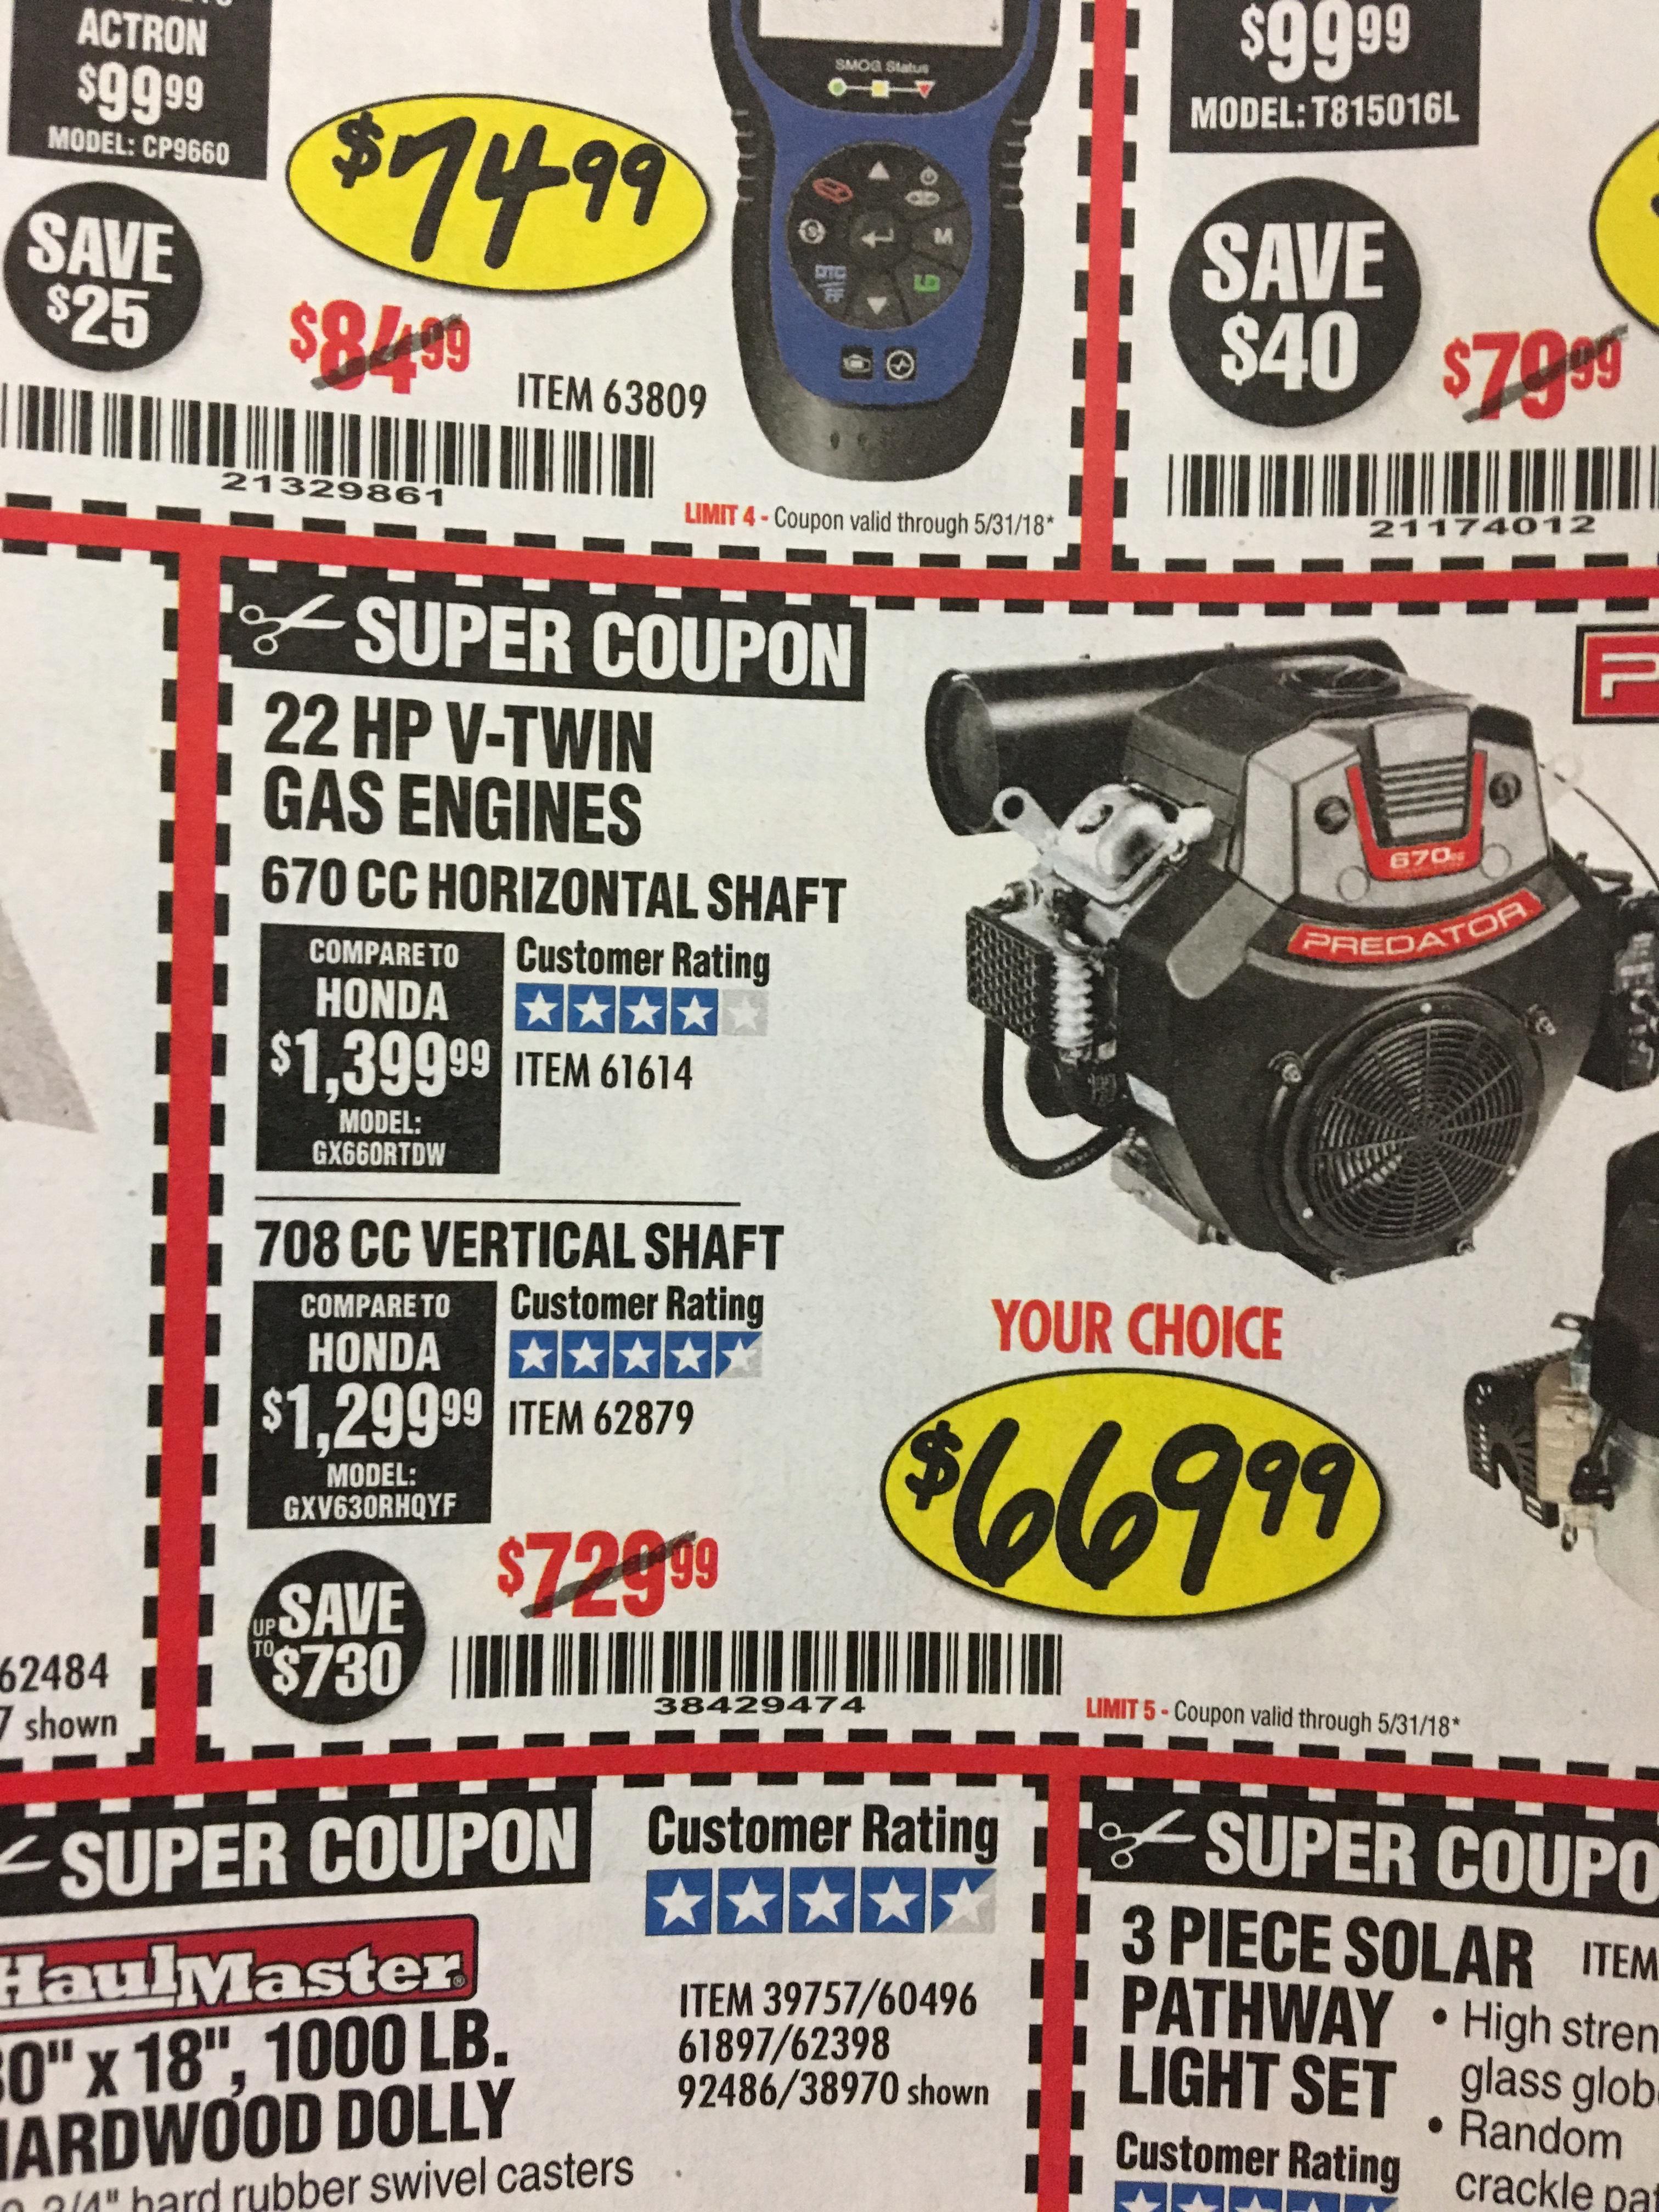 Predator engine coupon code - Supplies & Equipment